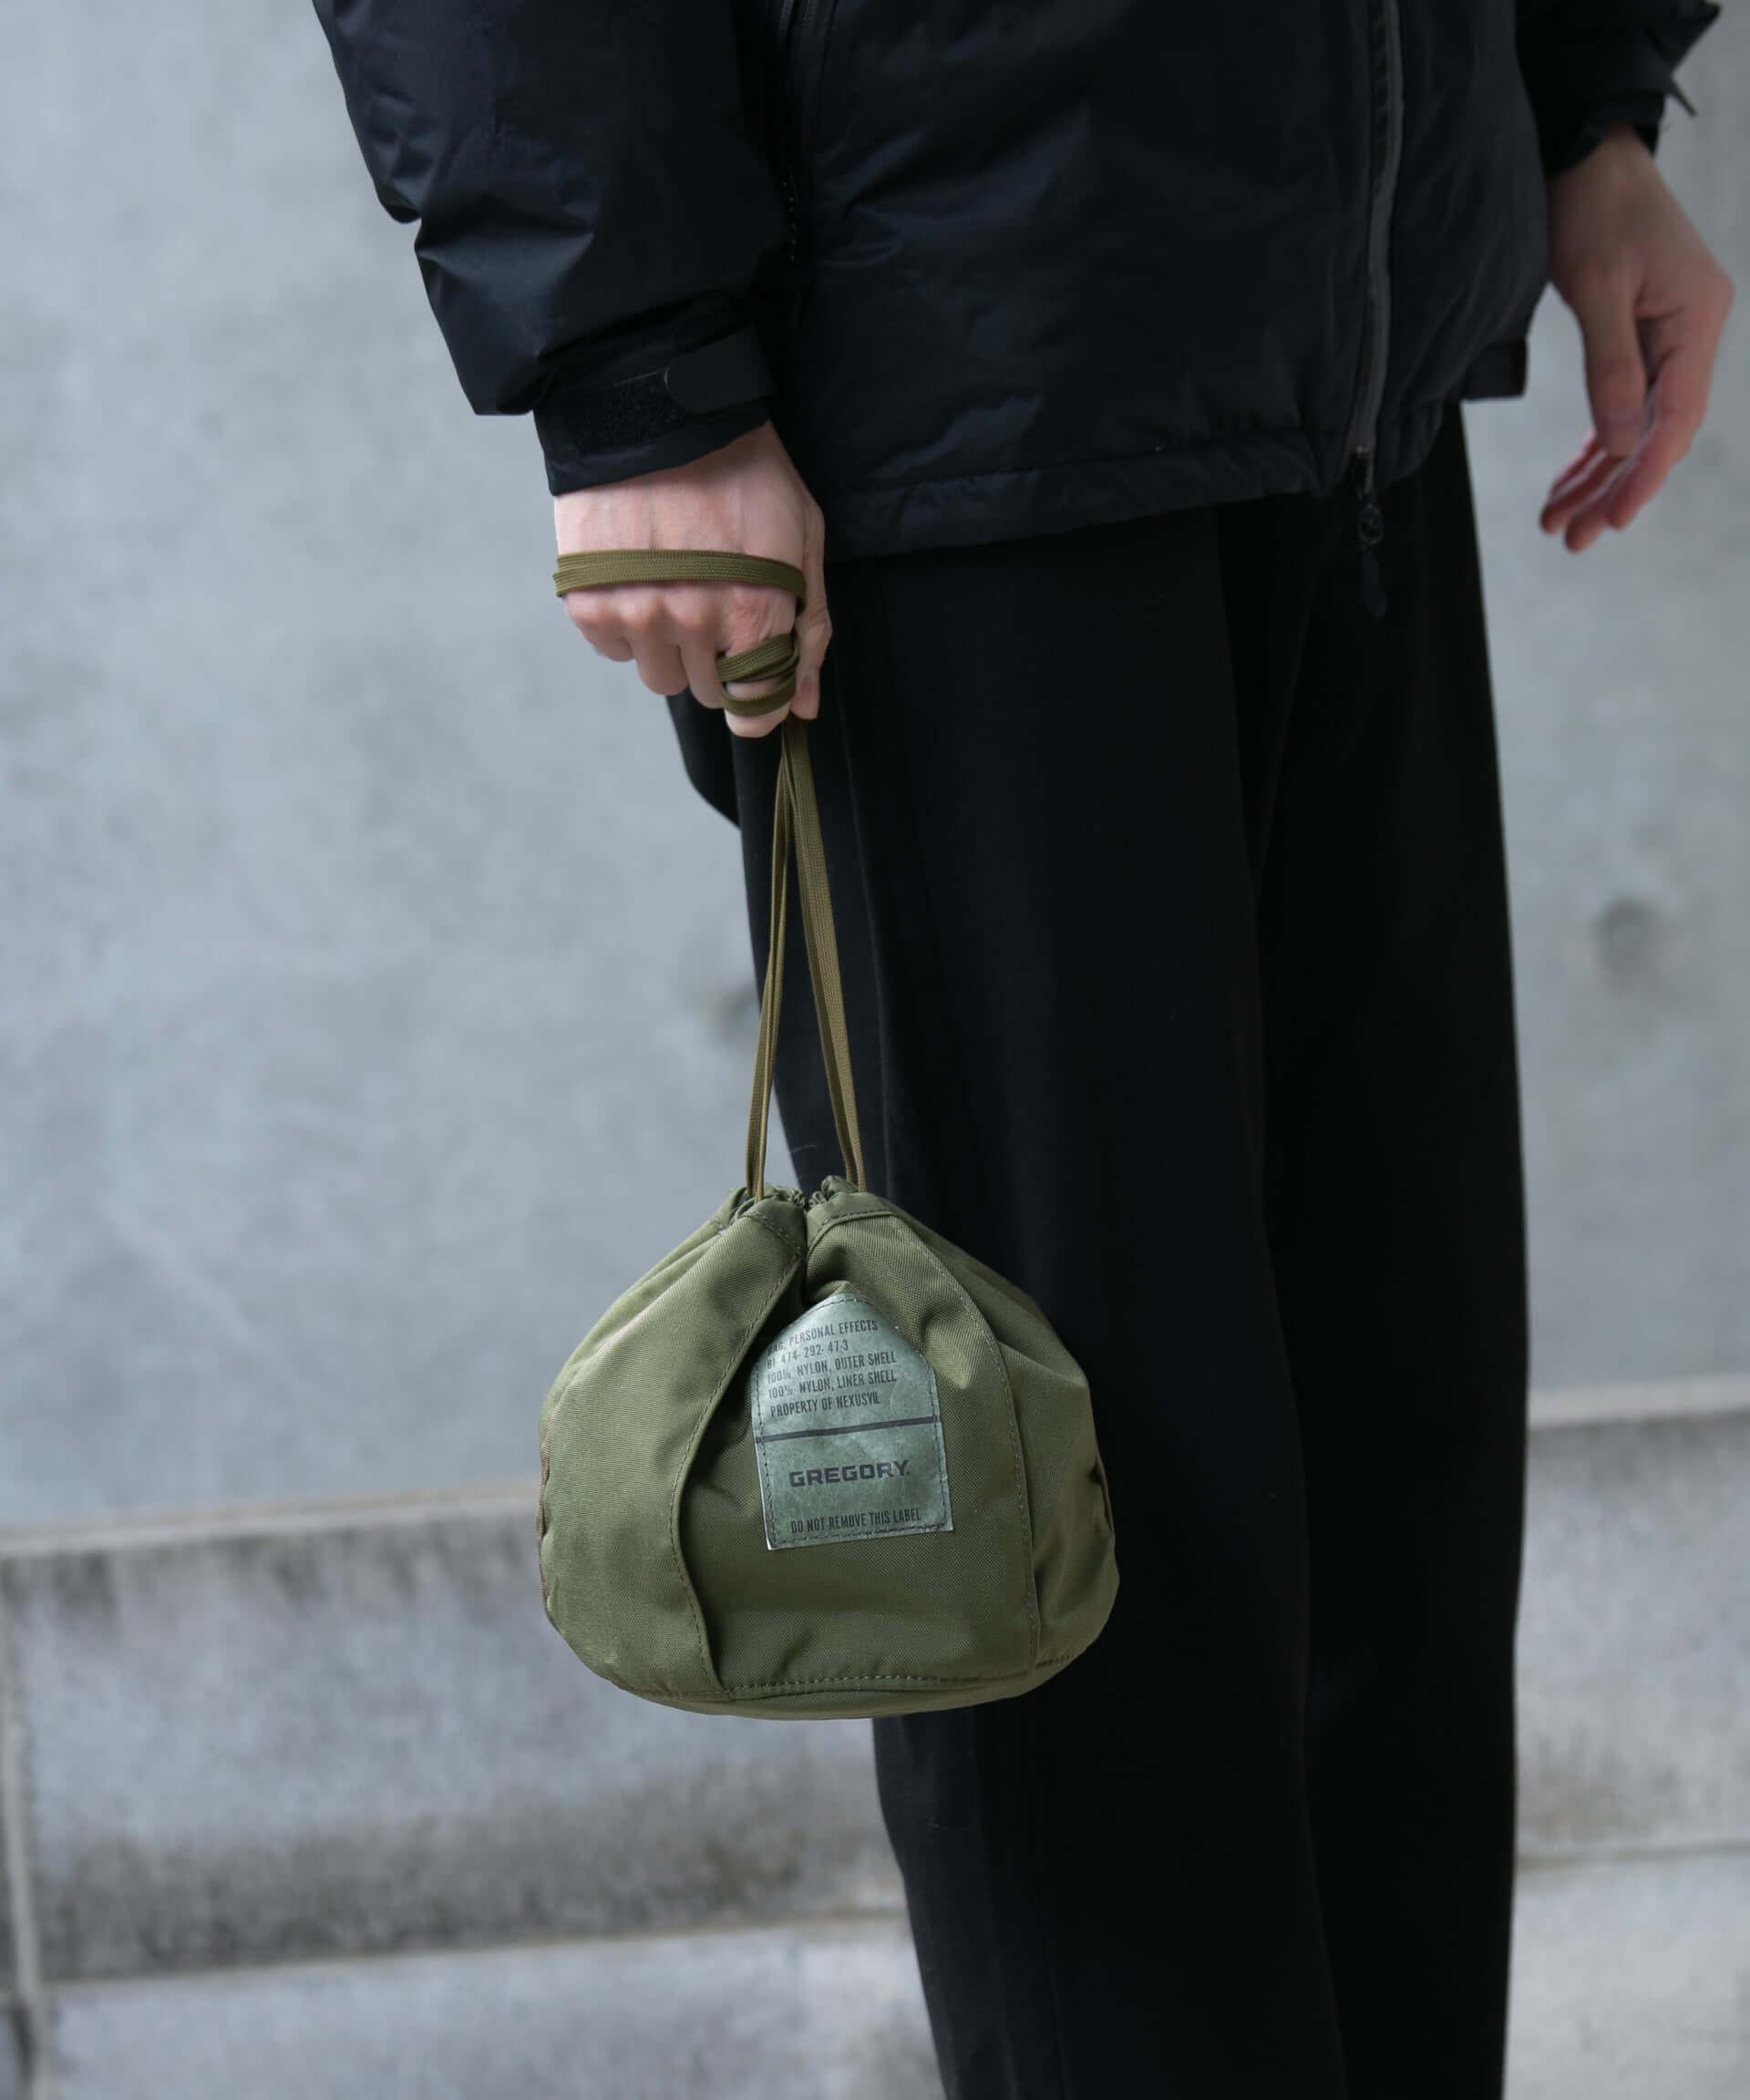 GREGORYとNEXUSVII.による特別コレクション「MILITARY PACK」に新作が登場!巾着型バッグ、ウエストバッグが数量限定で発売決定 lf210113_militarypack_2-1920x2304